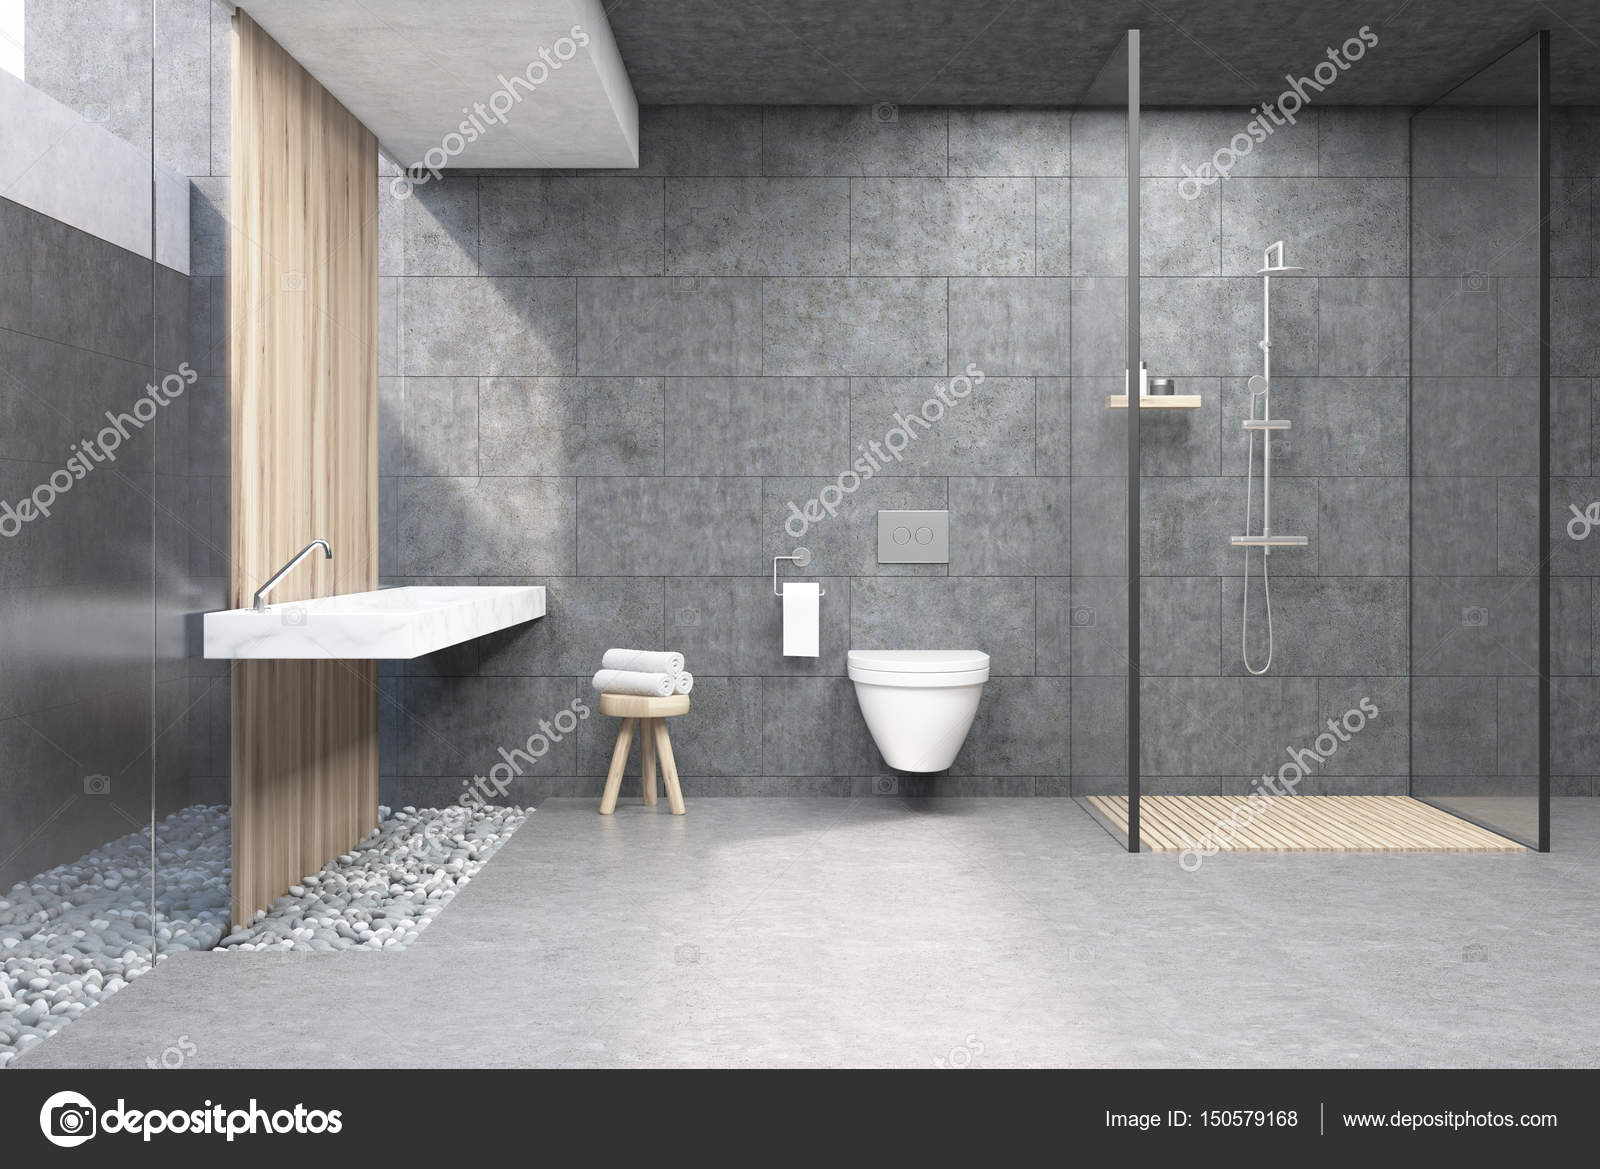 https://st3.depositphotos.com/2673929/15057/i/1600/depositphotos_150579168-stock-photo-bathroom-interior-with-gray-walls.jpg